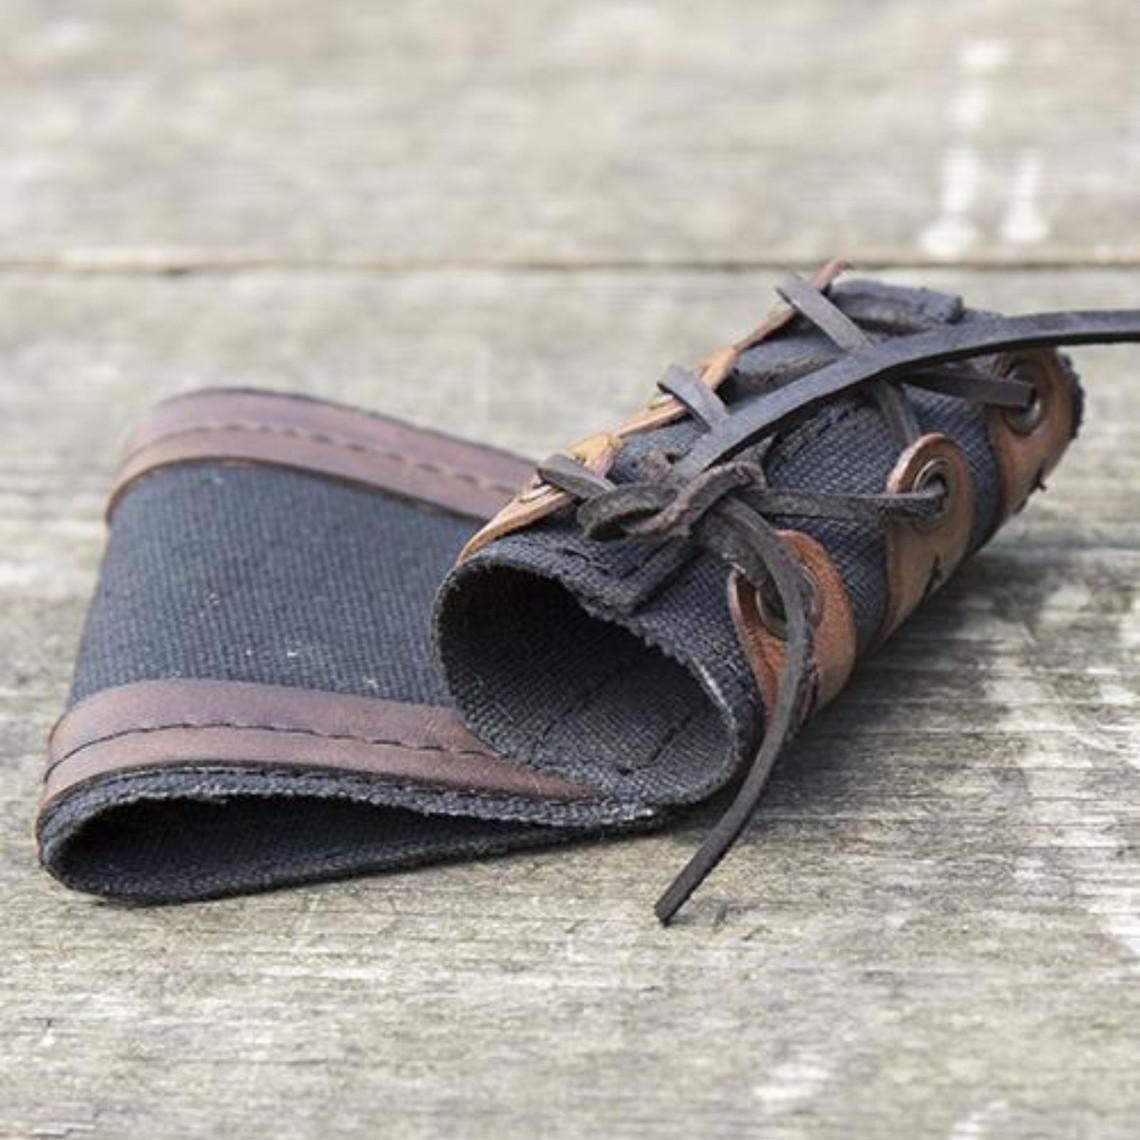 Epic Armoury RFB LARP pugnale-porta spada, nero-marrone